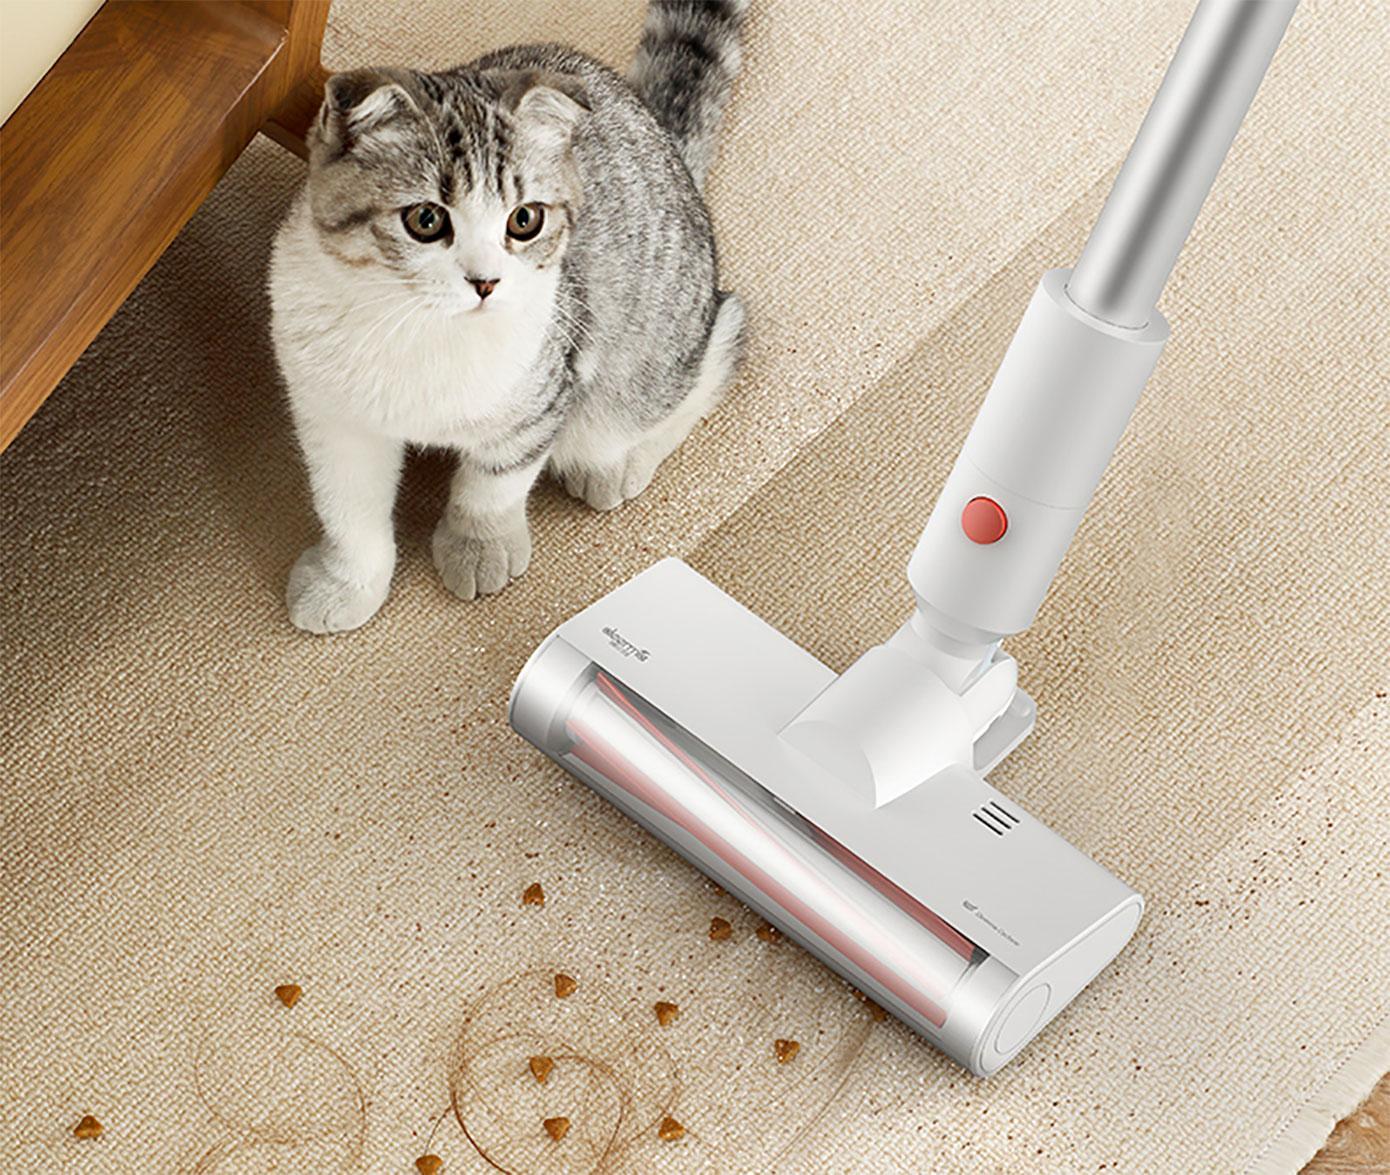 Opisanie Besprovodnoj Ruchnoj Pylesos Deerma Vc25 Wireless Vacuum Cleaner Dem Vc25 5